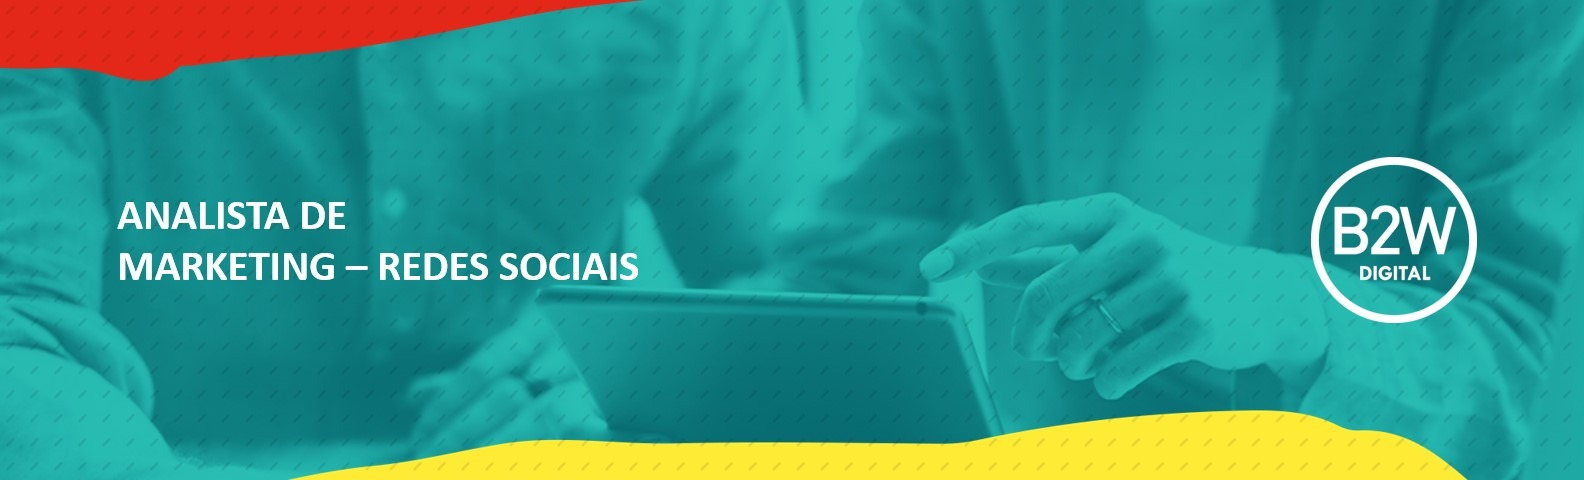 Analista de Marketing SR – Redes Sociais